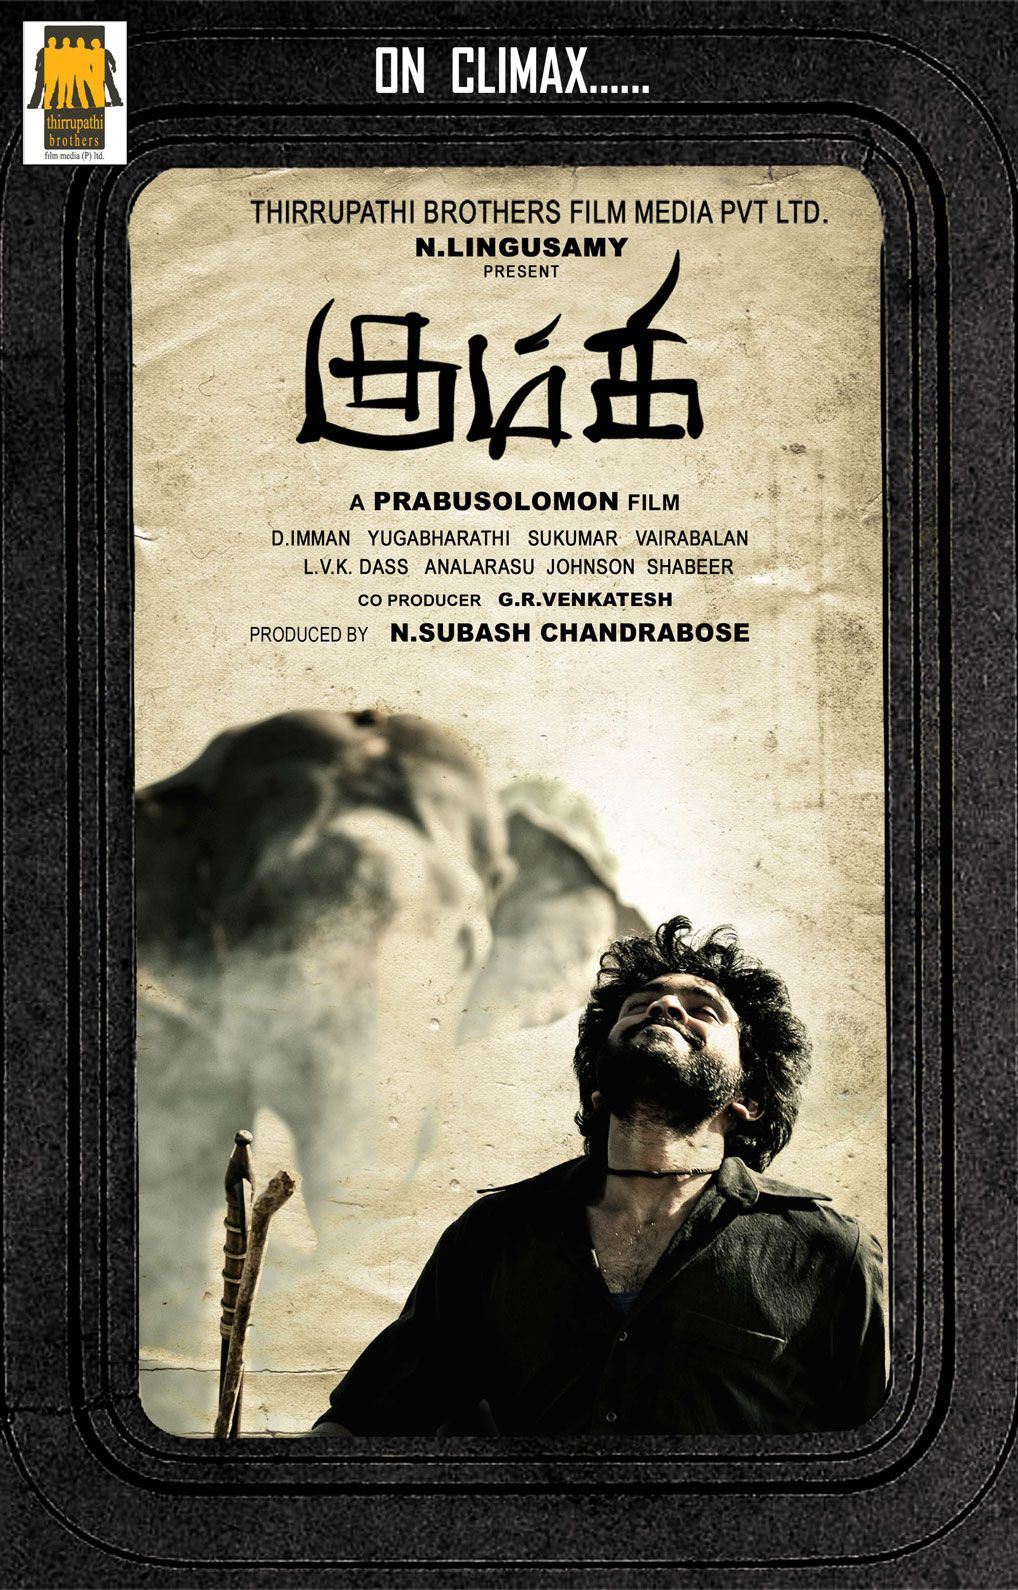 Kumki tamil film songs mp3 free download.